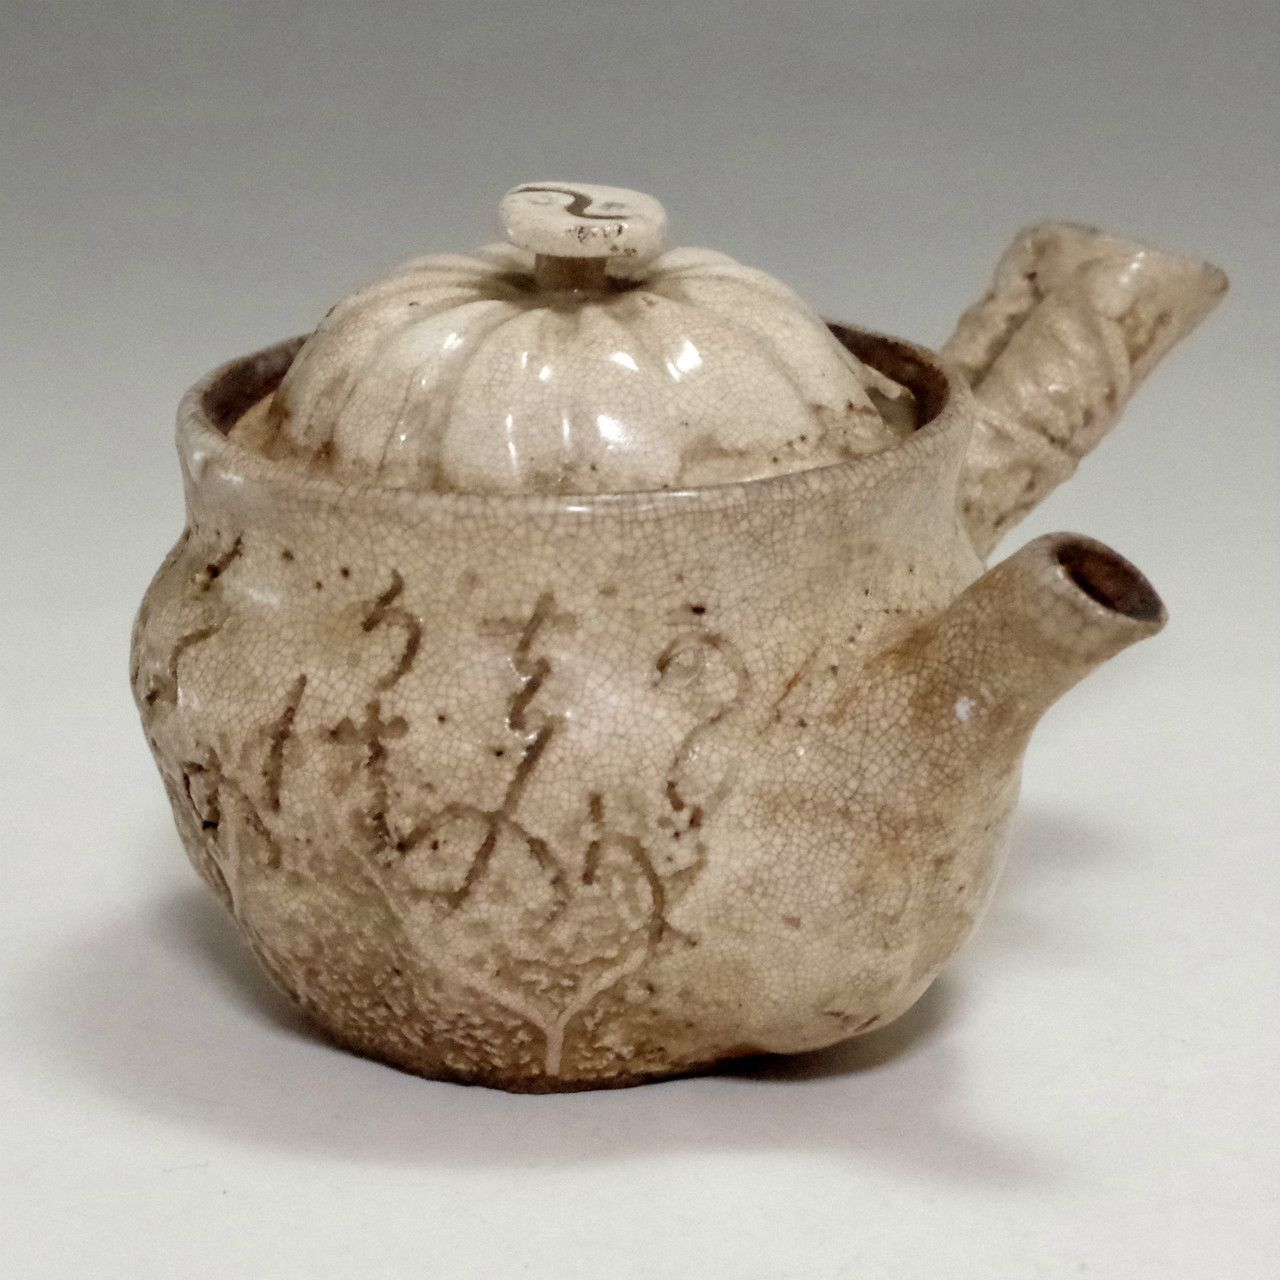 Antique japanese pottery tea pot by otagaki rengetsu 1924 antique japanese pottery tea pot by otagaki rengetsu 1924 reviewsmspy